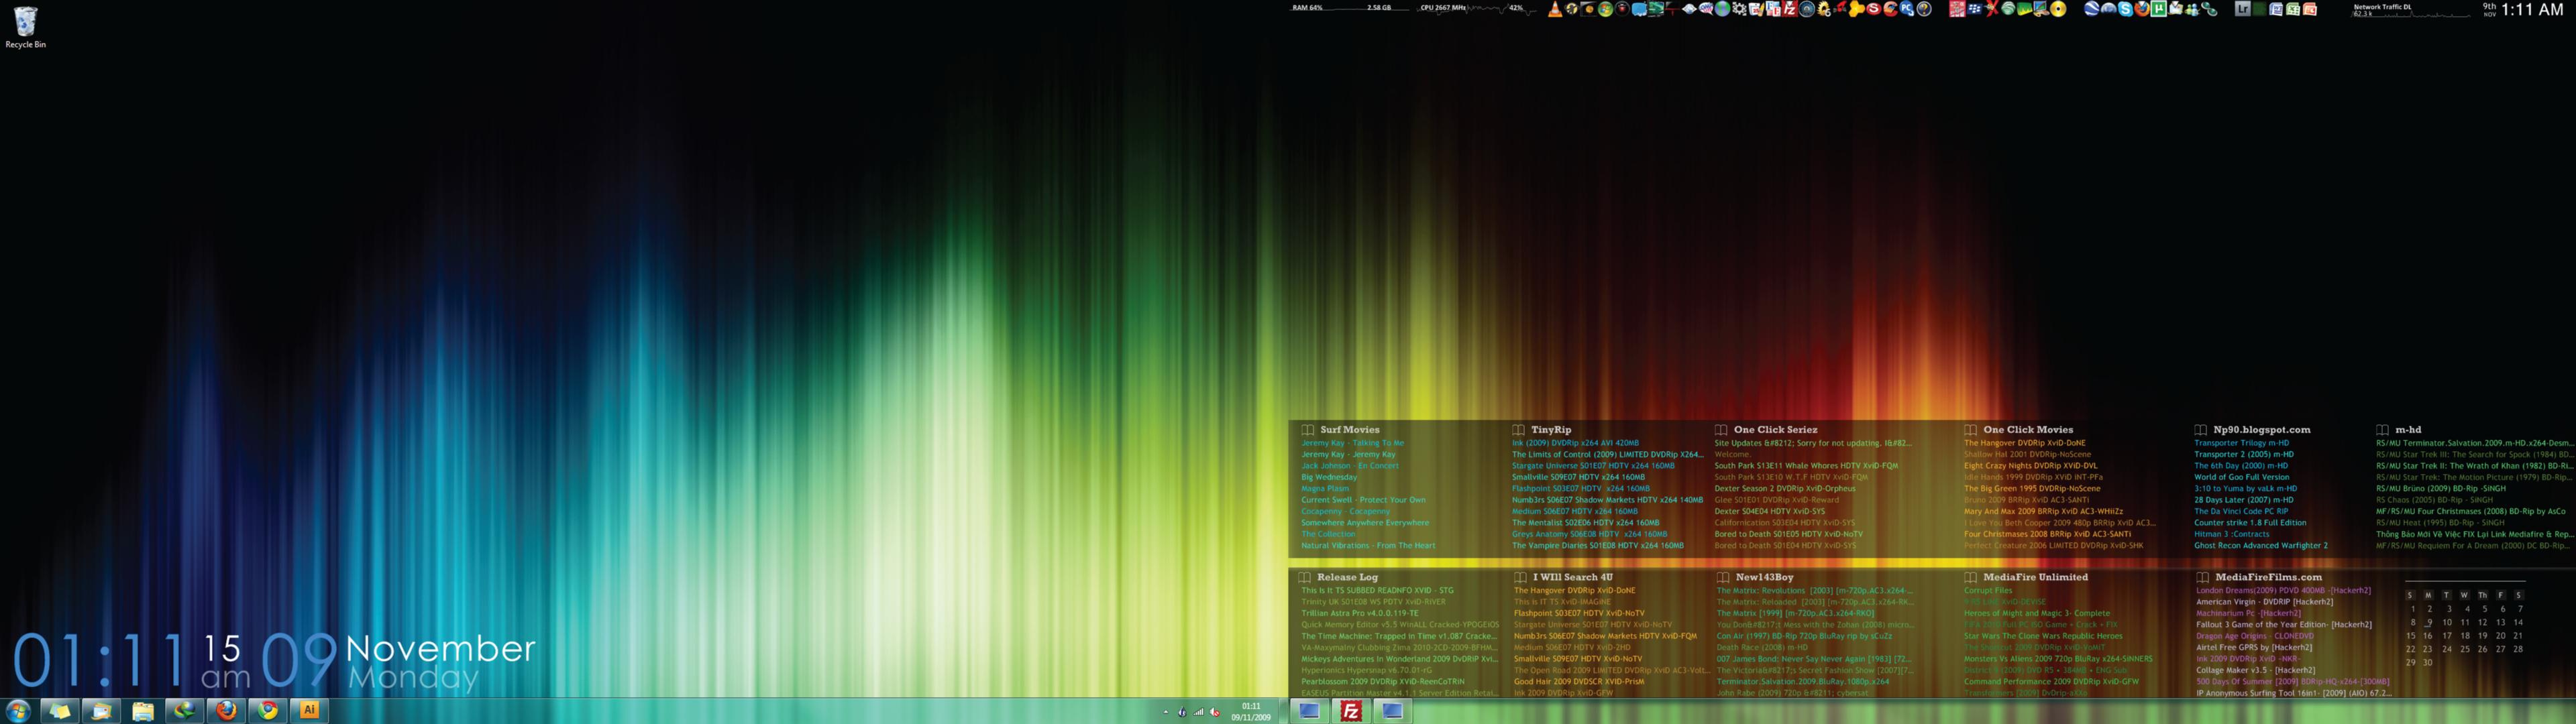 Dual Screen Desktop Windows 7 By Bengatley On Deviantart